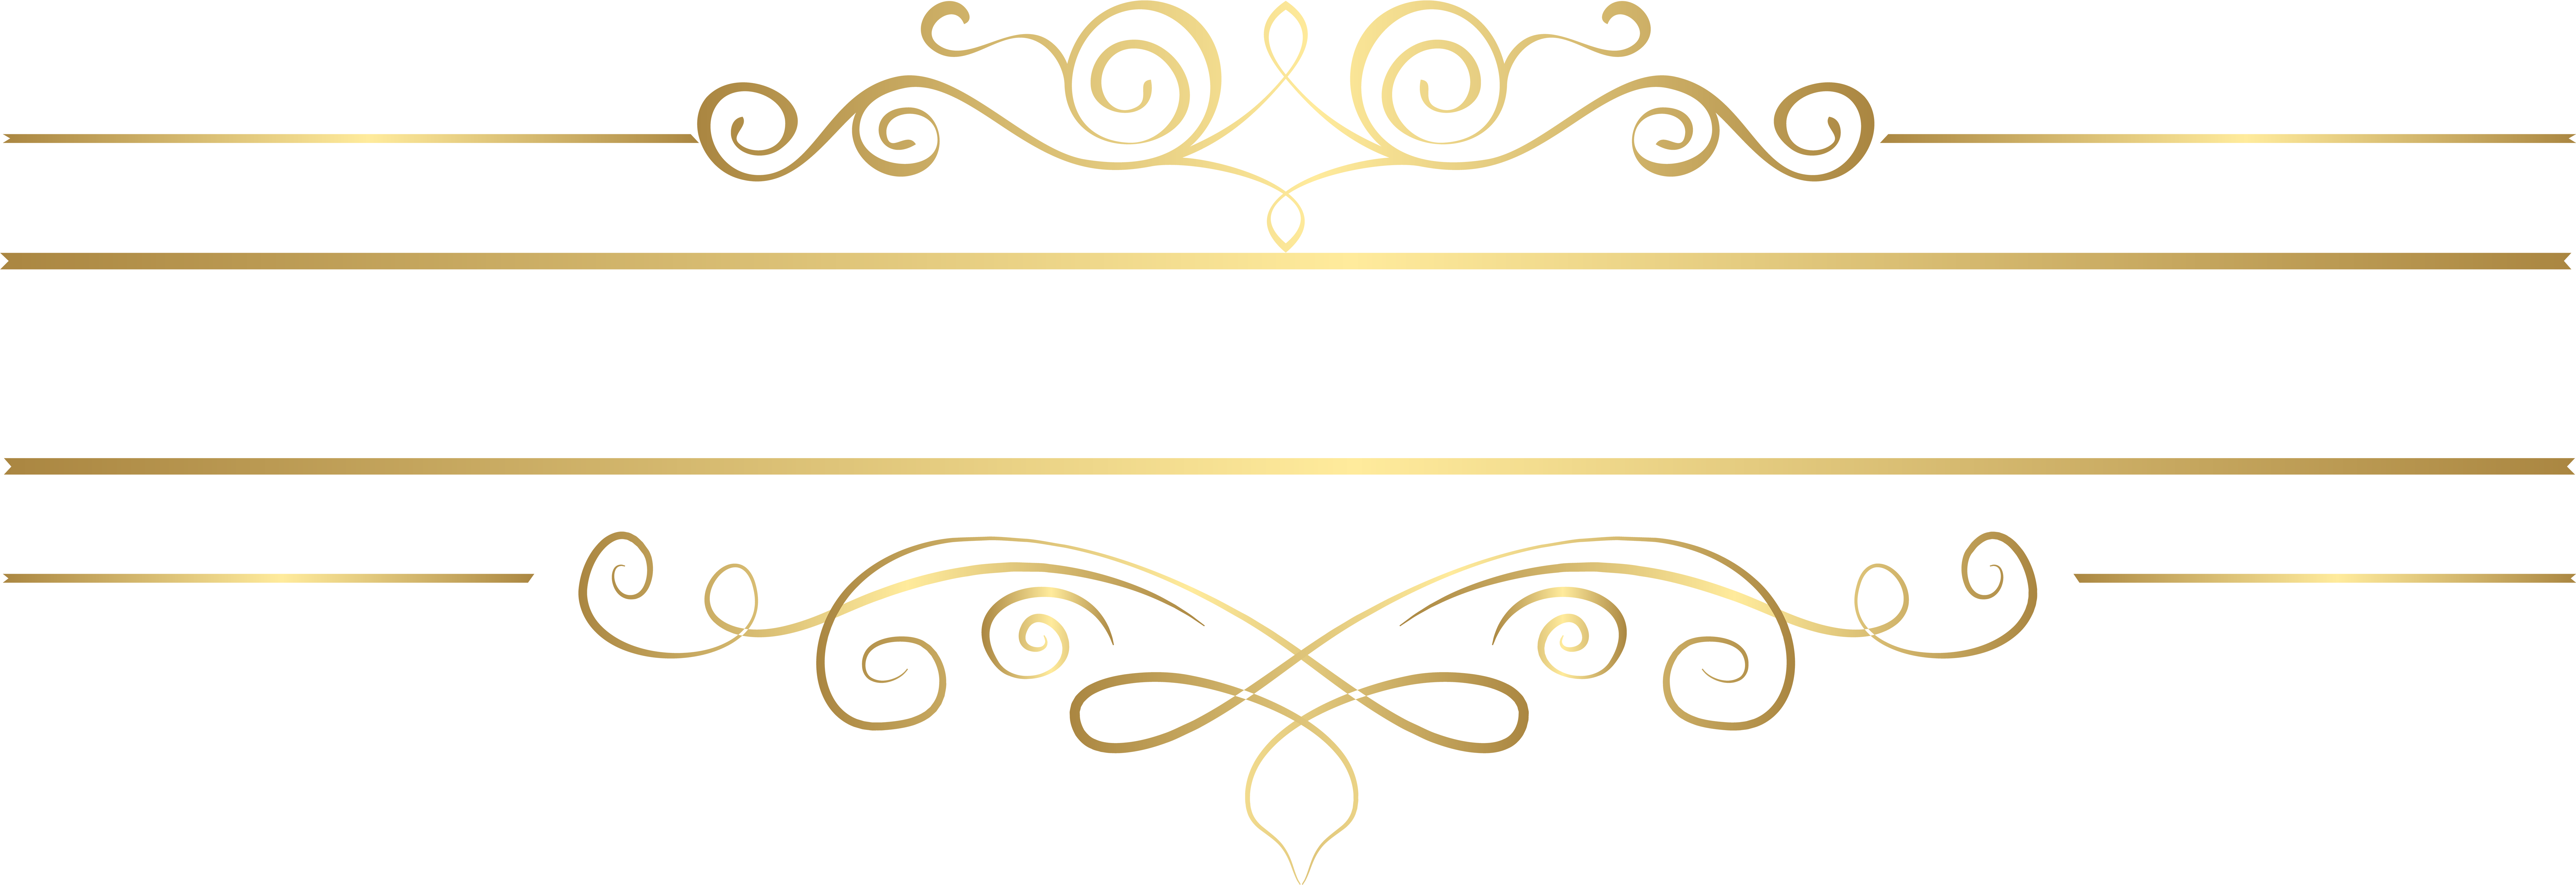 HD Gold Decorative Lines Png Transparent Background.